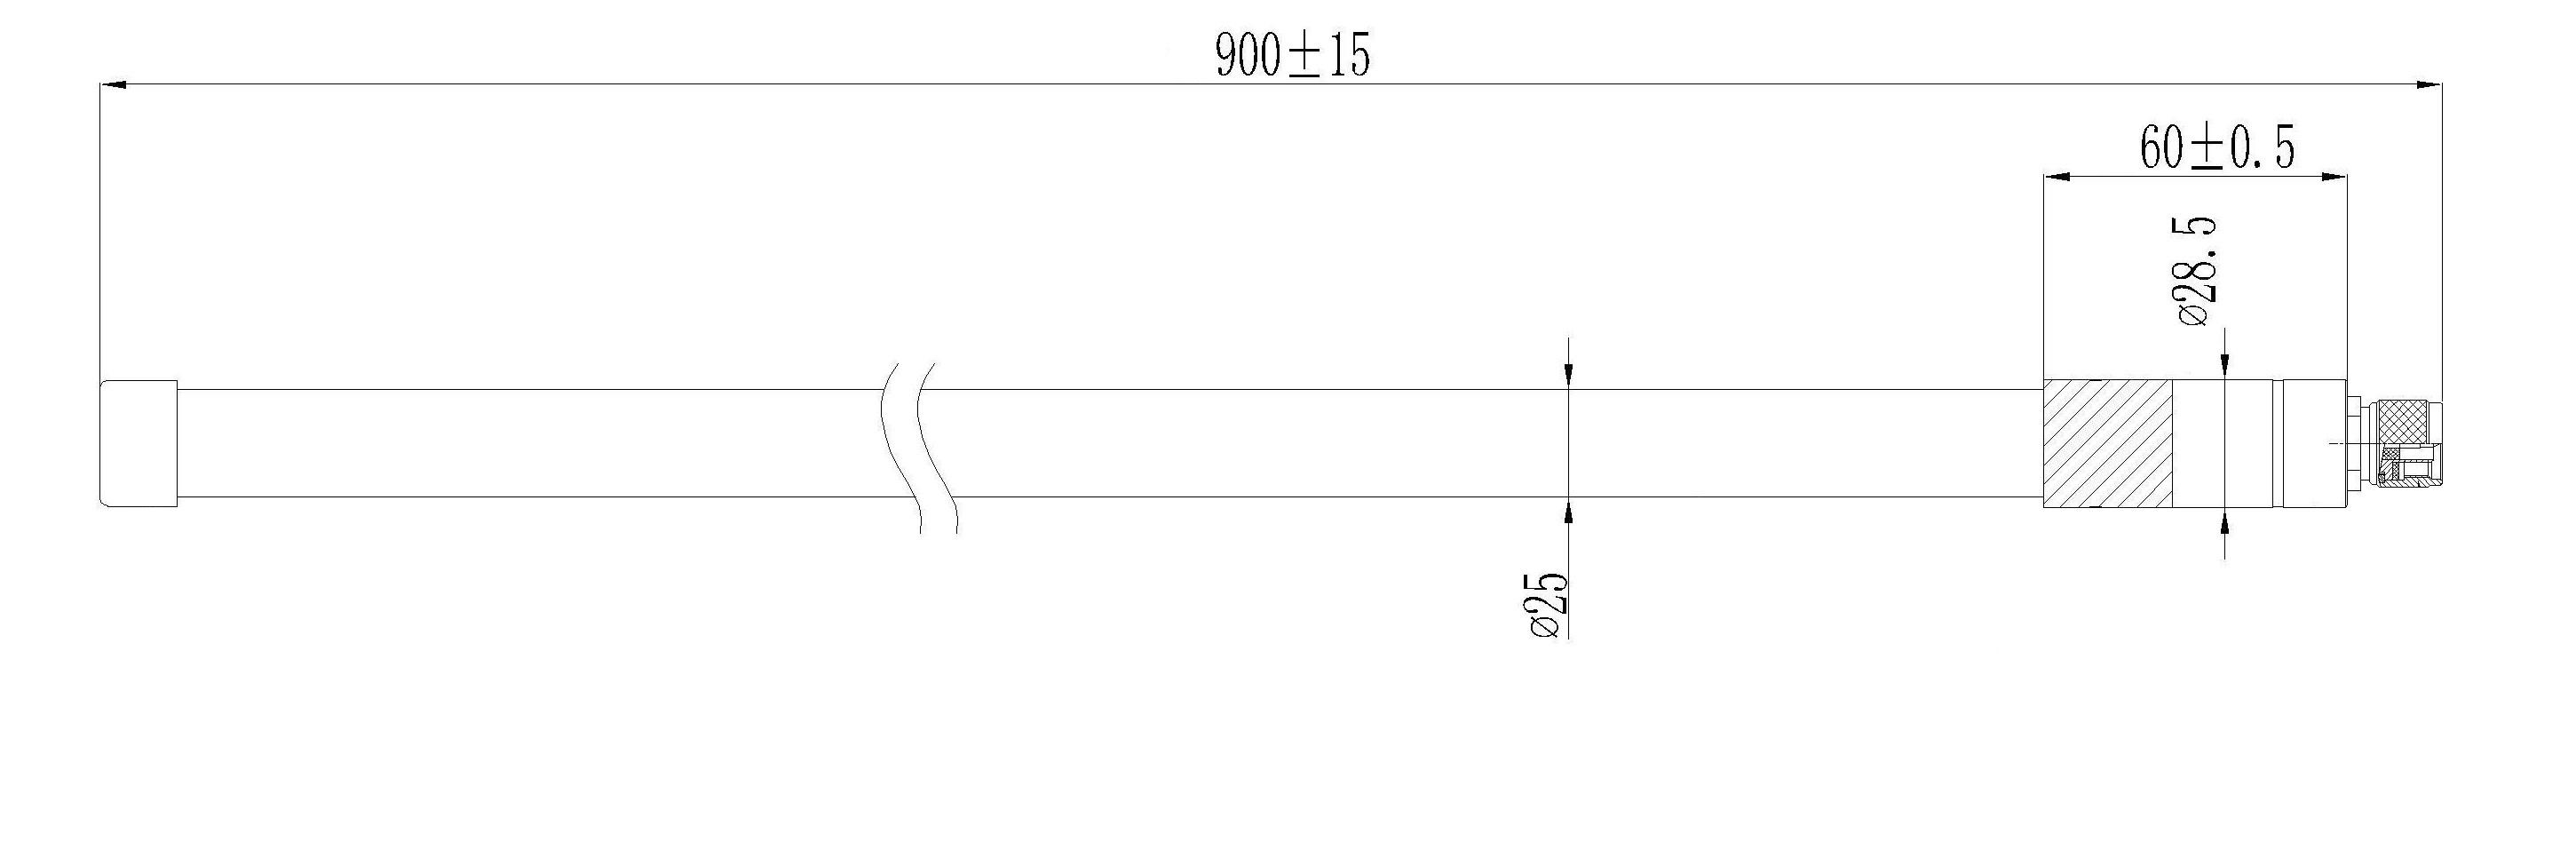 RAKARG15 Atenna dimensions